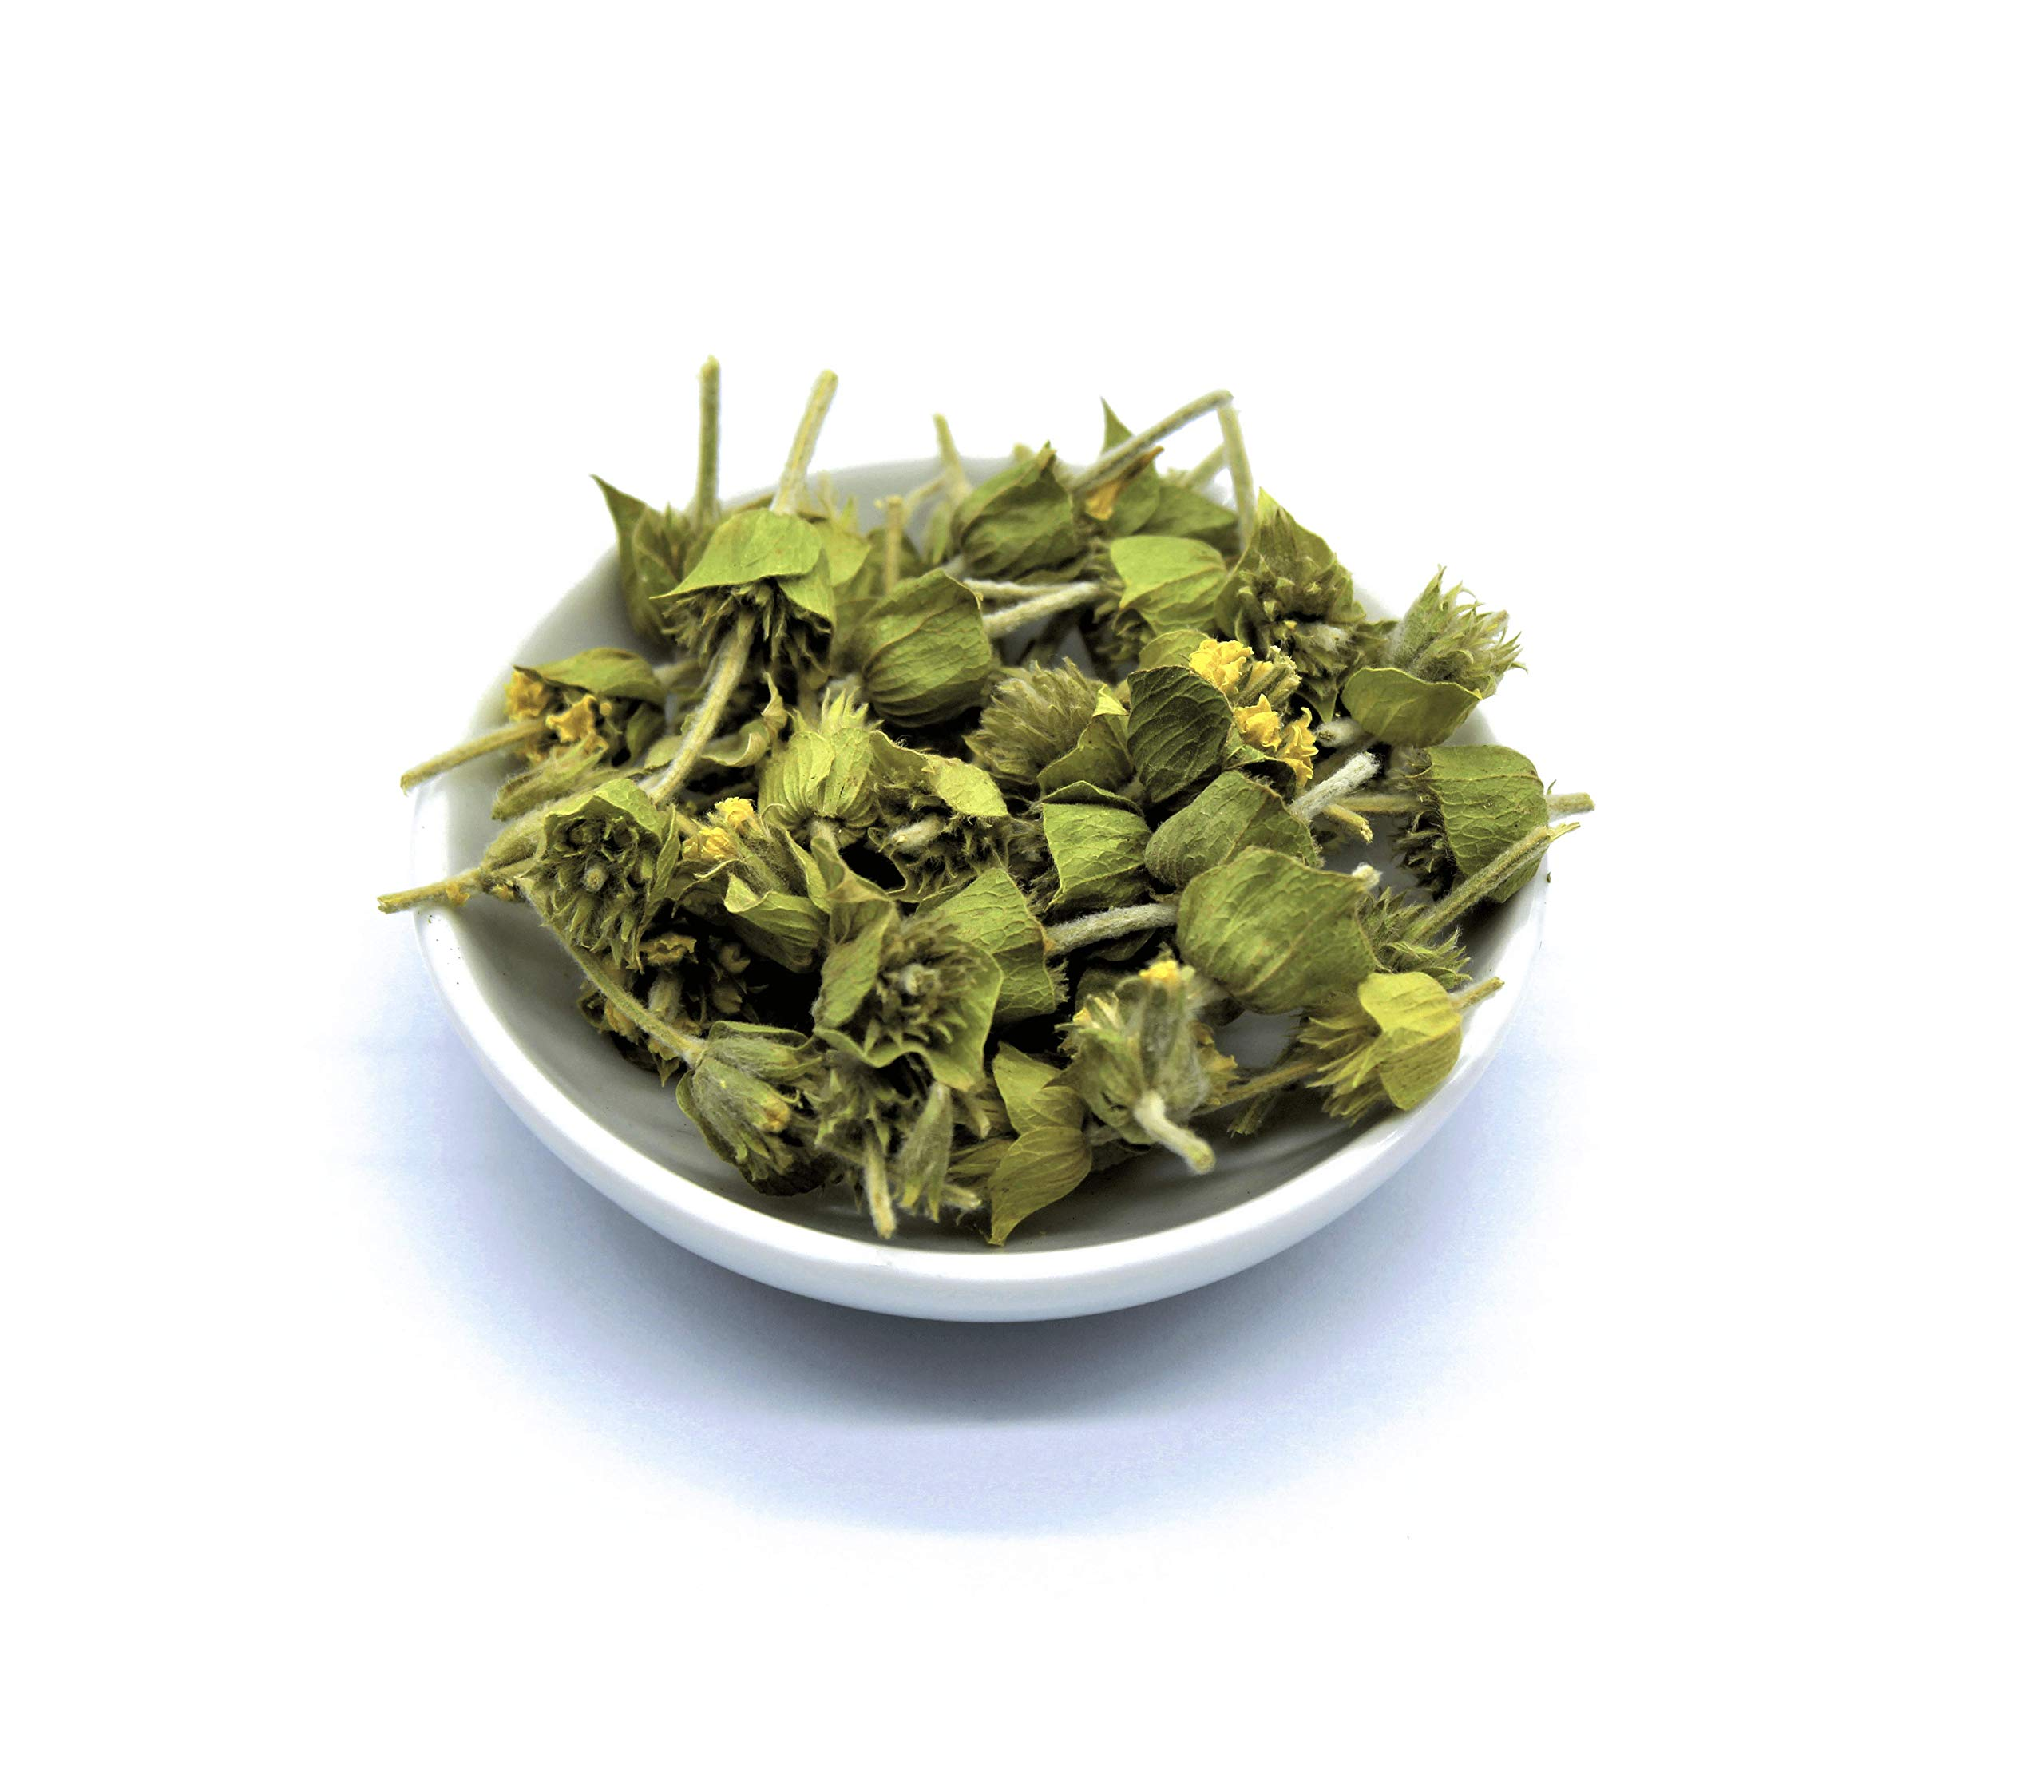 PEPPERMINTMAN-Griechischer-Bergtee-Sideritis-scardica-60g-getrocknet-Tee-mit-Premiumqualitt-hocharomatisch-mit-Zimtaroma-griechischer-Ursprung